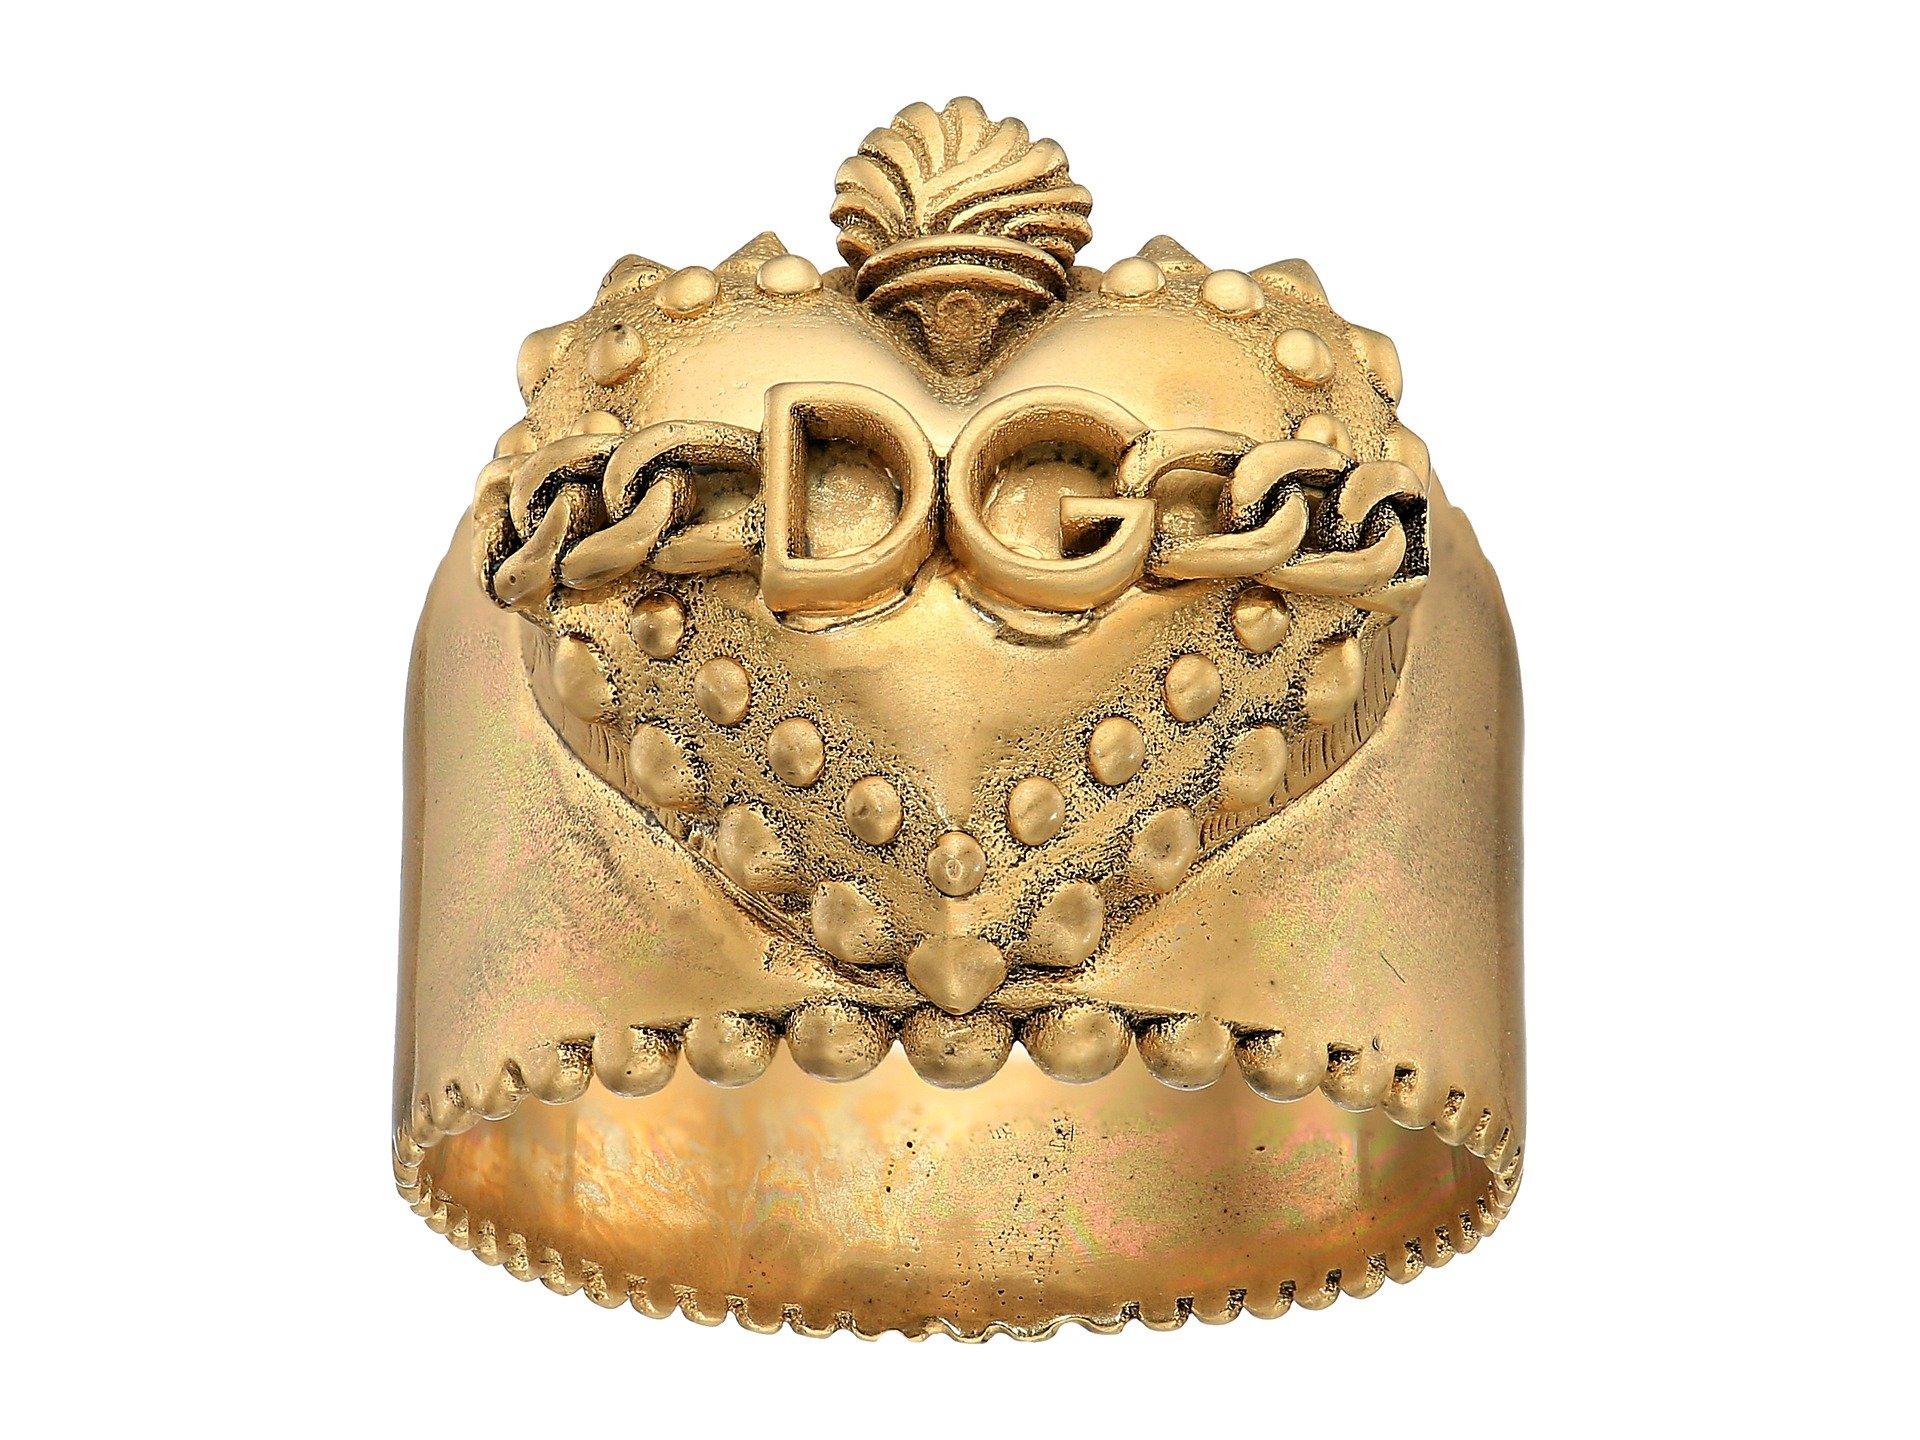 Anillo para Hombre Dolce andamp; Gabbana Sacred Heart Ring  + Dolce & Gabbana en VeoyCompro.net